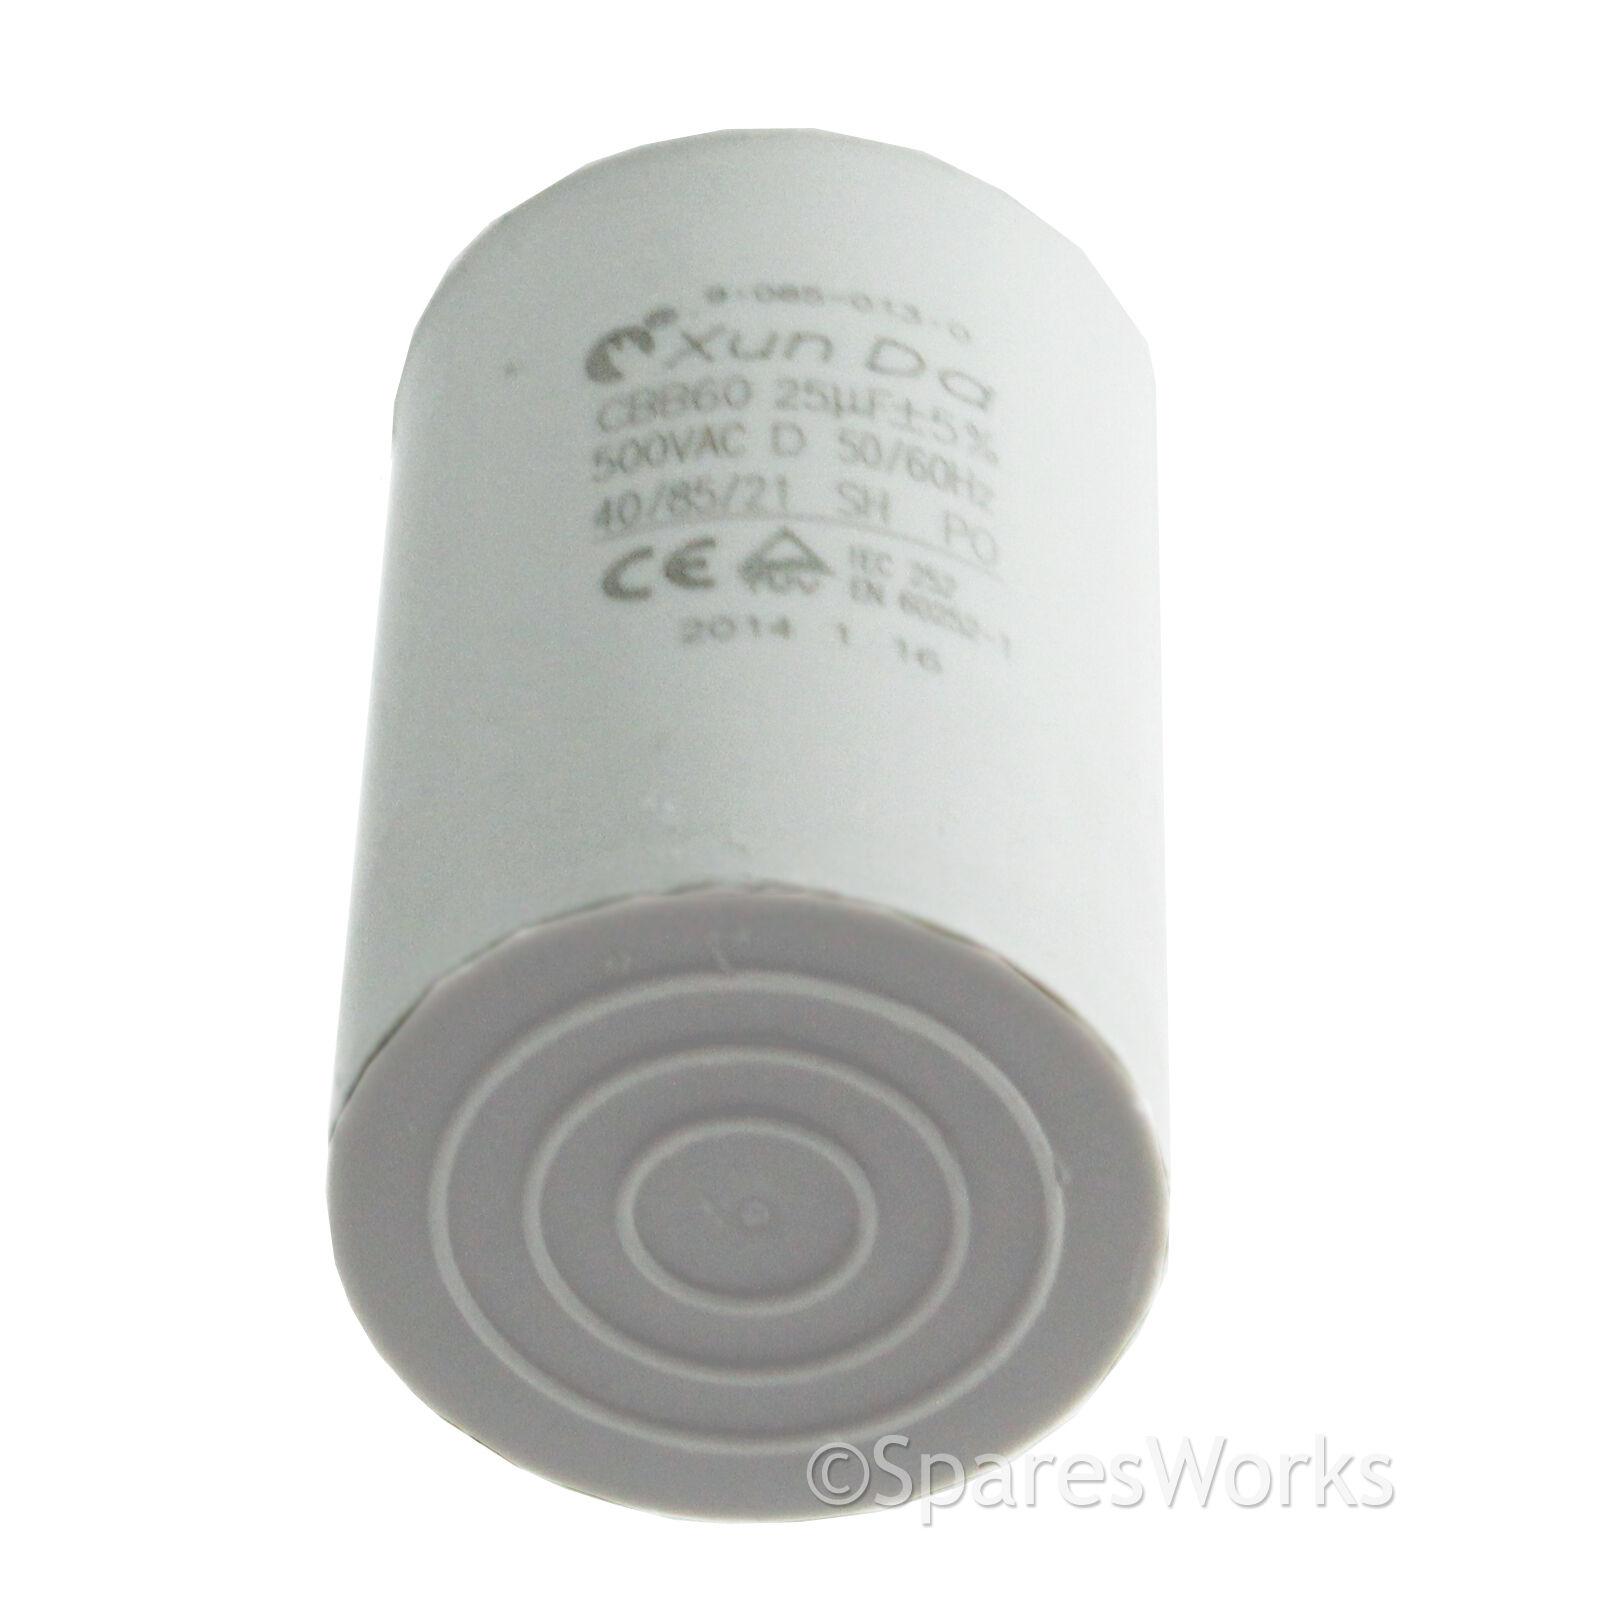 Véritable karcher KB4 KB5 25UF nettoyeur haute pression condensateur 25 25 25 uf KB403 kb502 kb503 8aac66